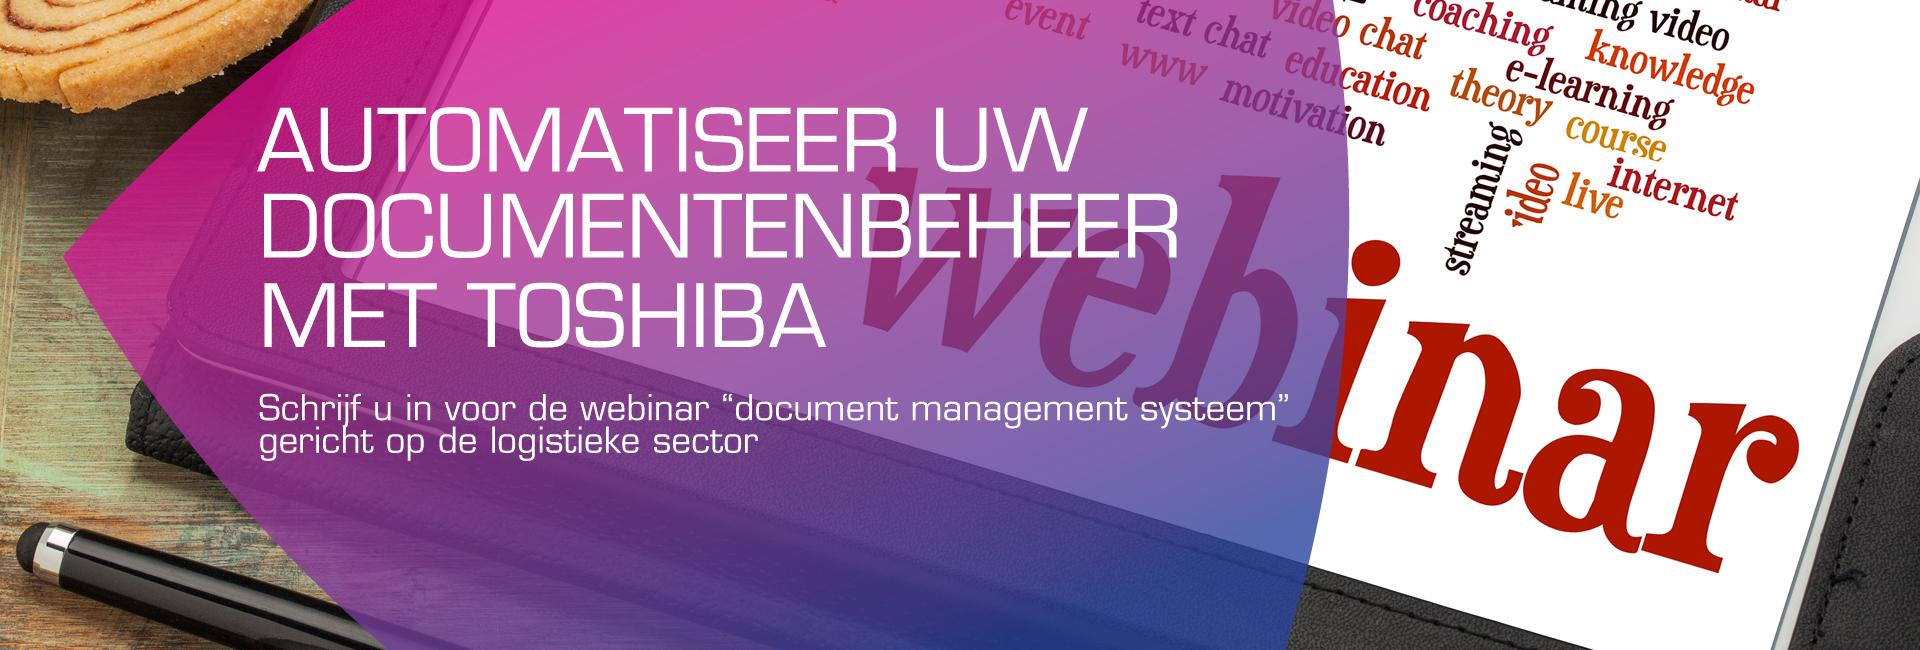 Webinar document management systeem